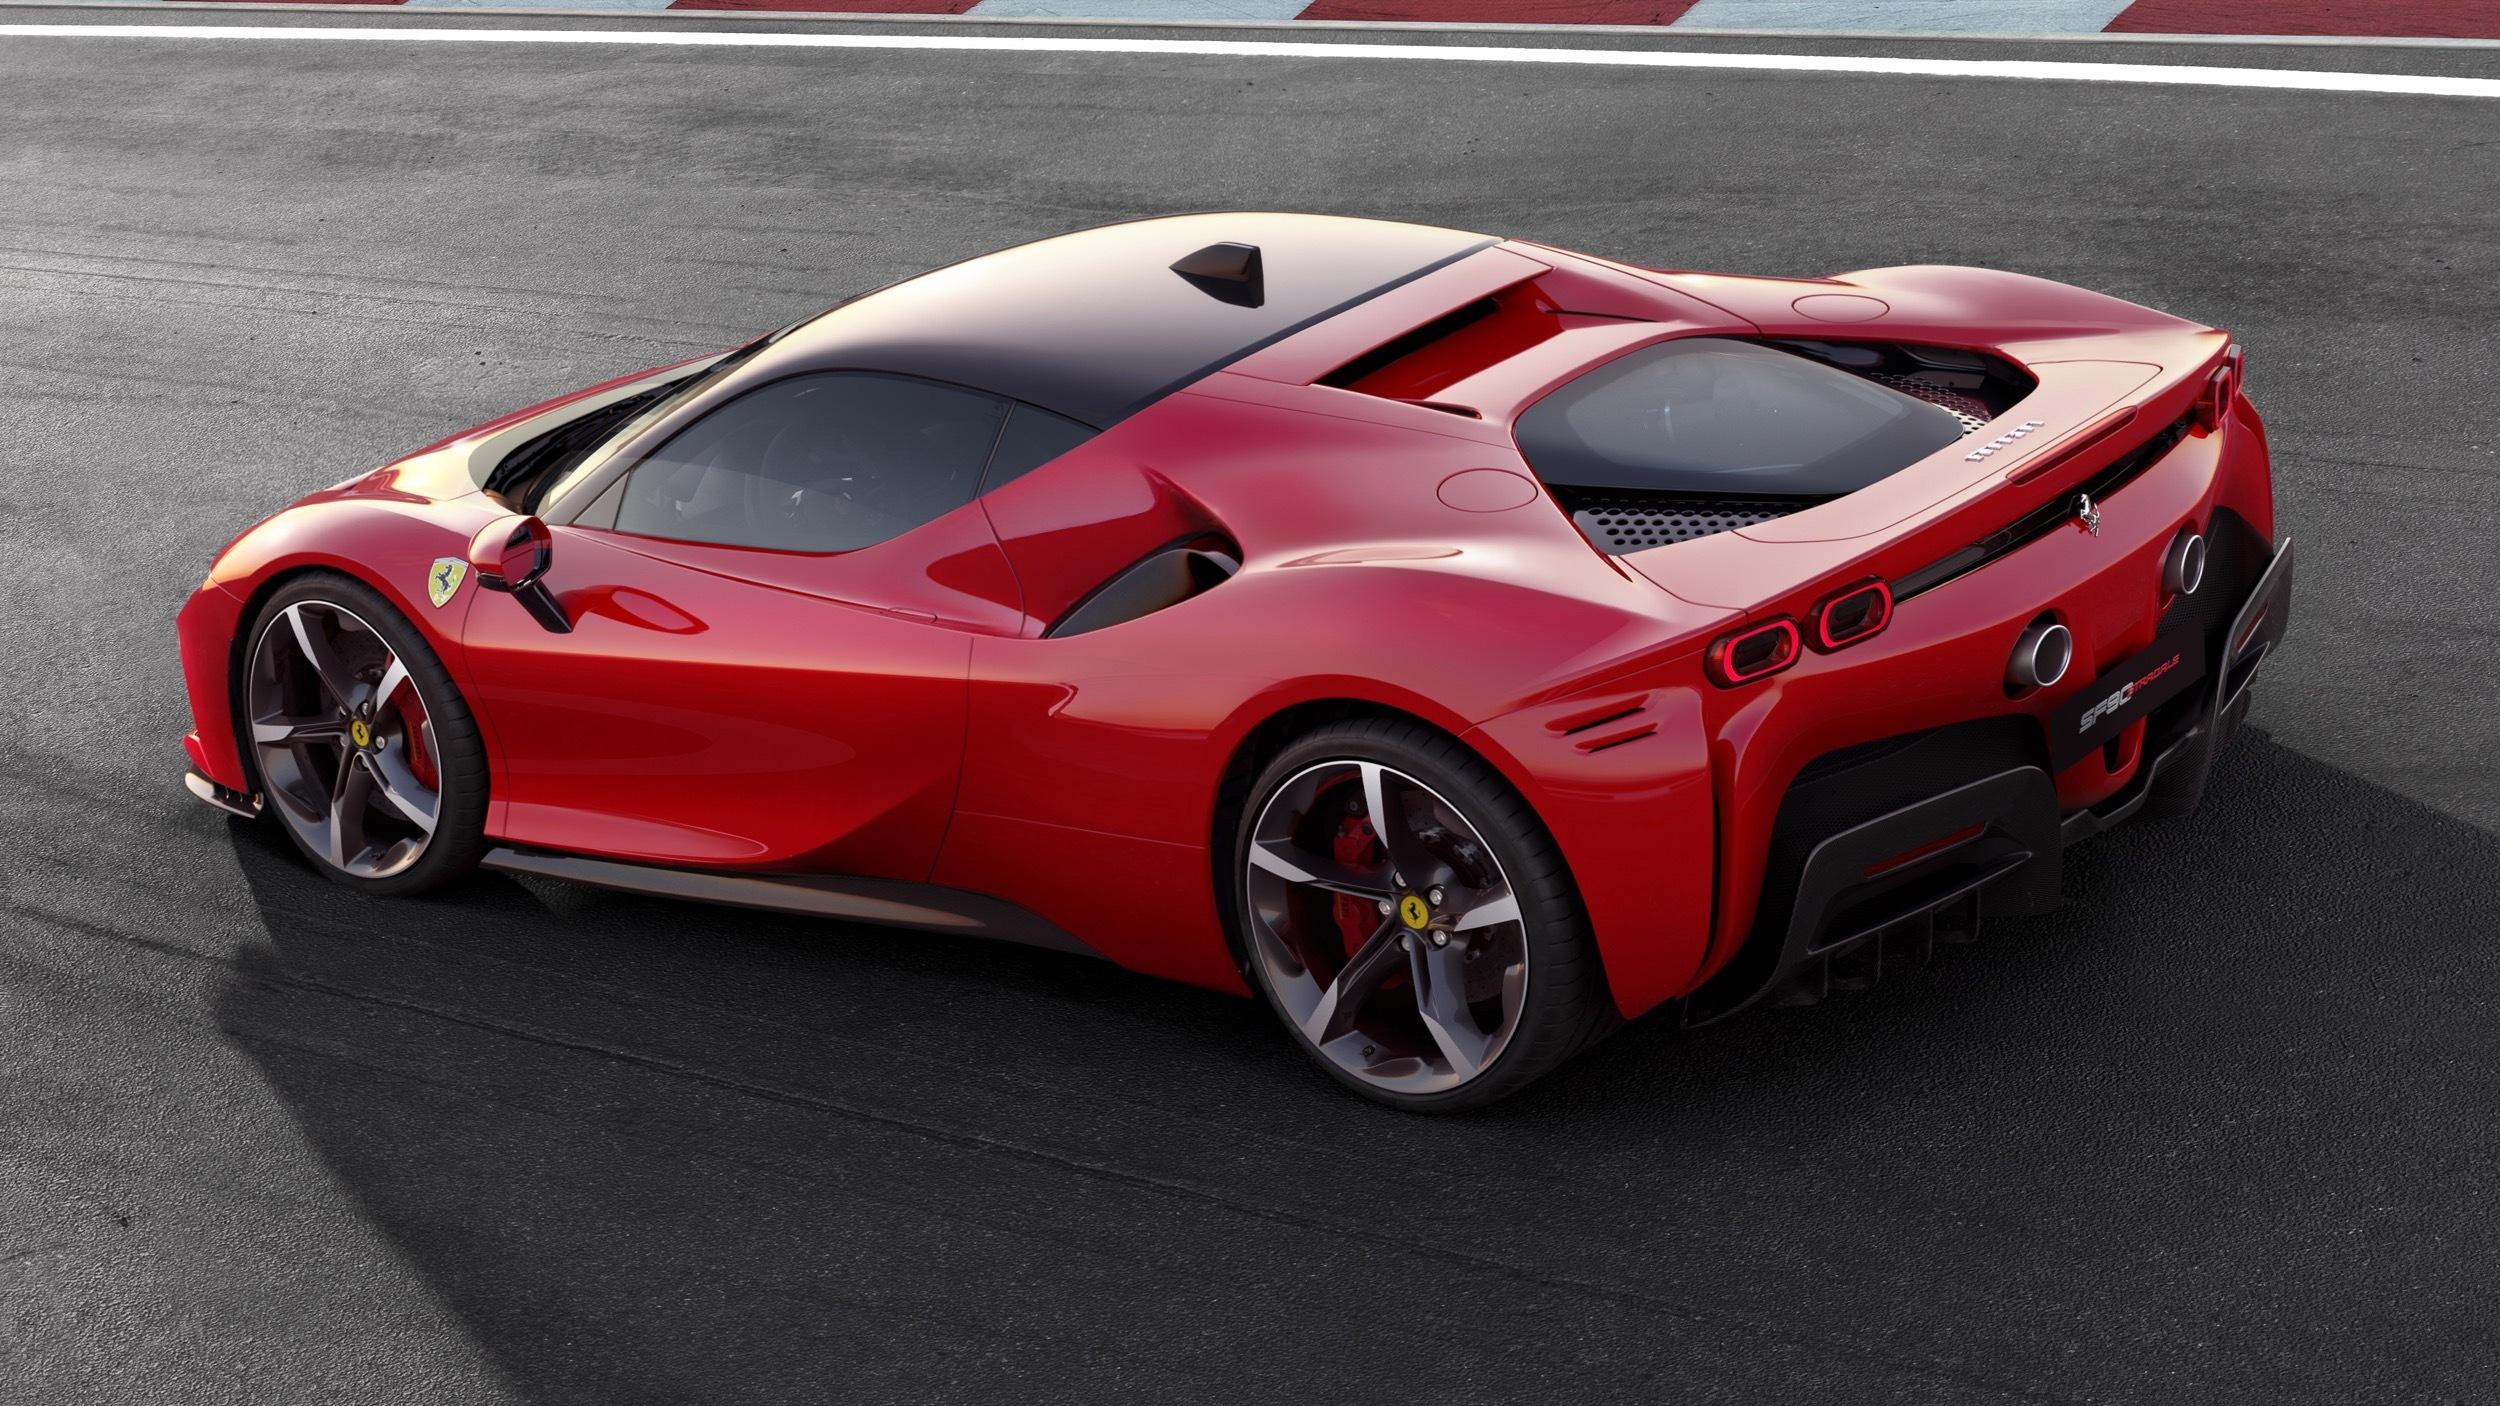 Ferrari Sf90 Stradale 2020 El Nuevo Super Hibrido Con Casi 1 000 Caballos A Bordo Univision